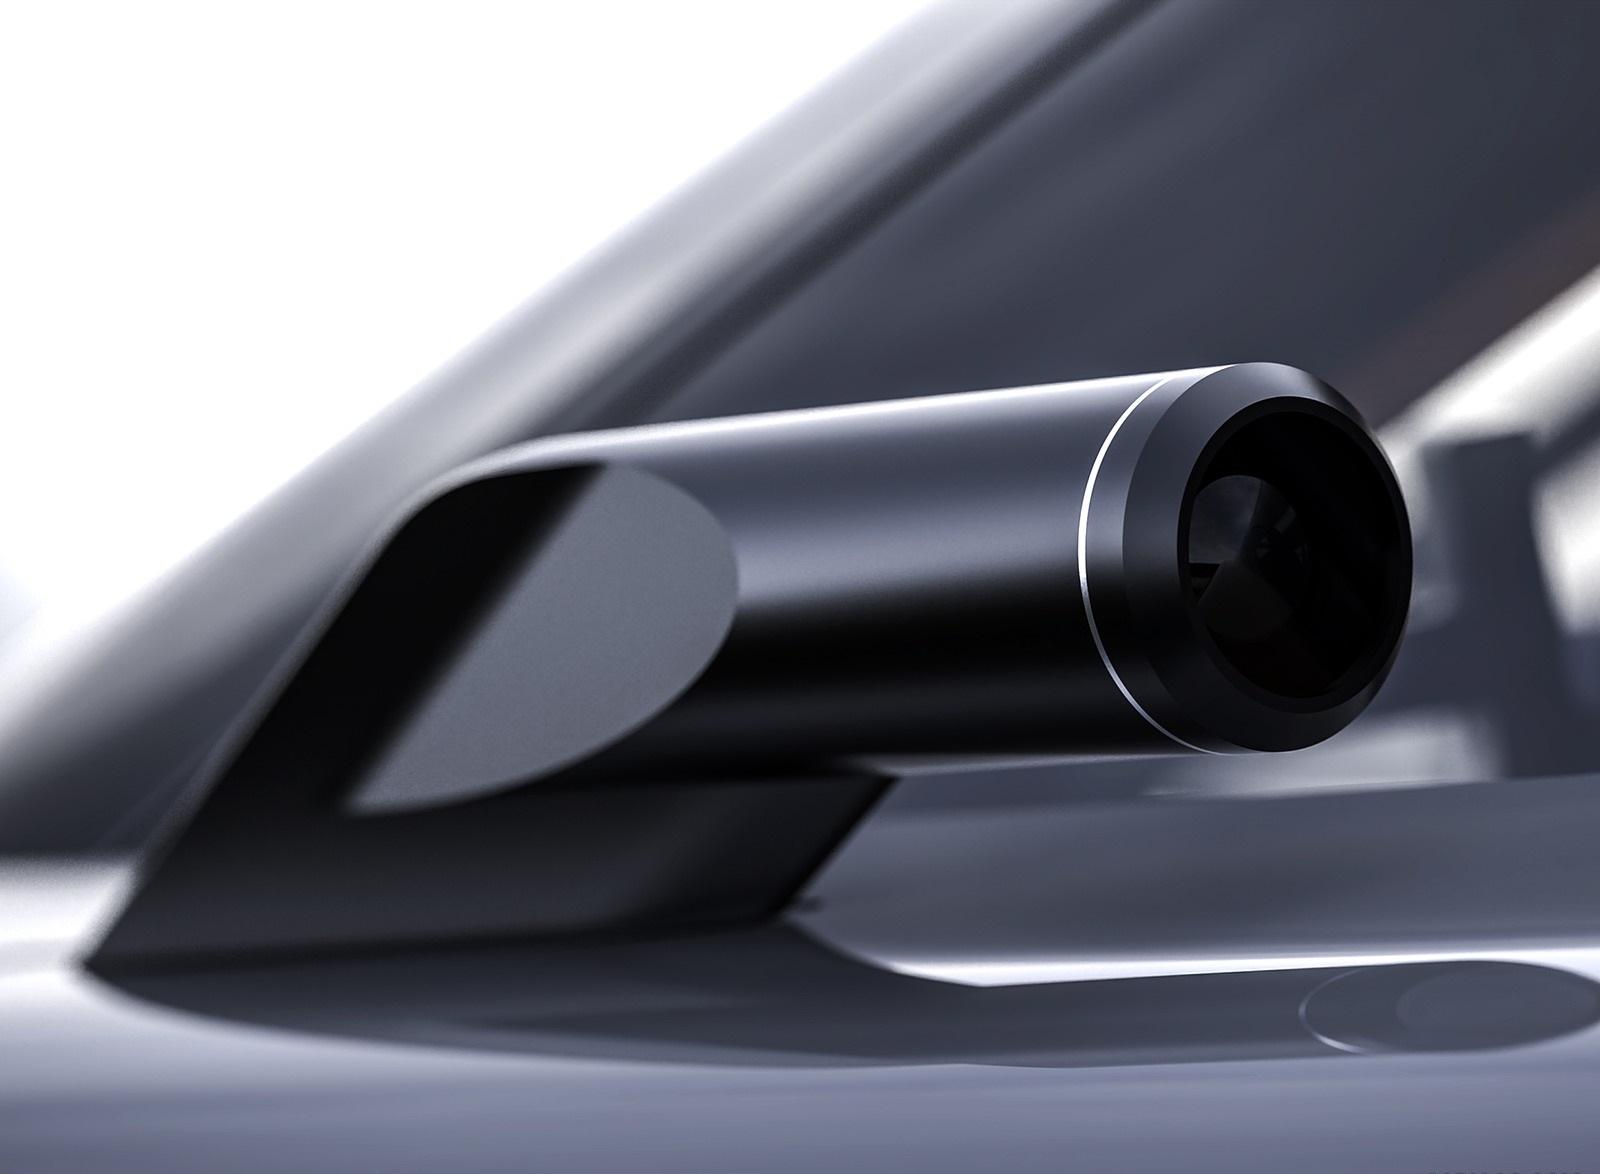 2021 Koenigsegg Gemera Side Camera Wallpapers #36 of 45